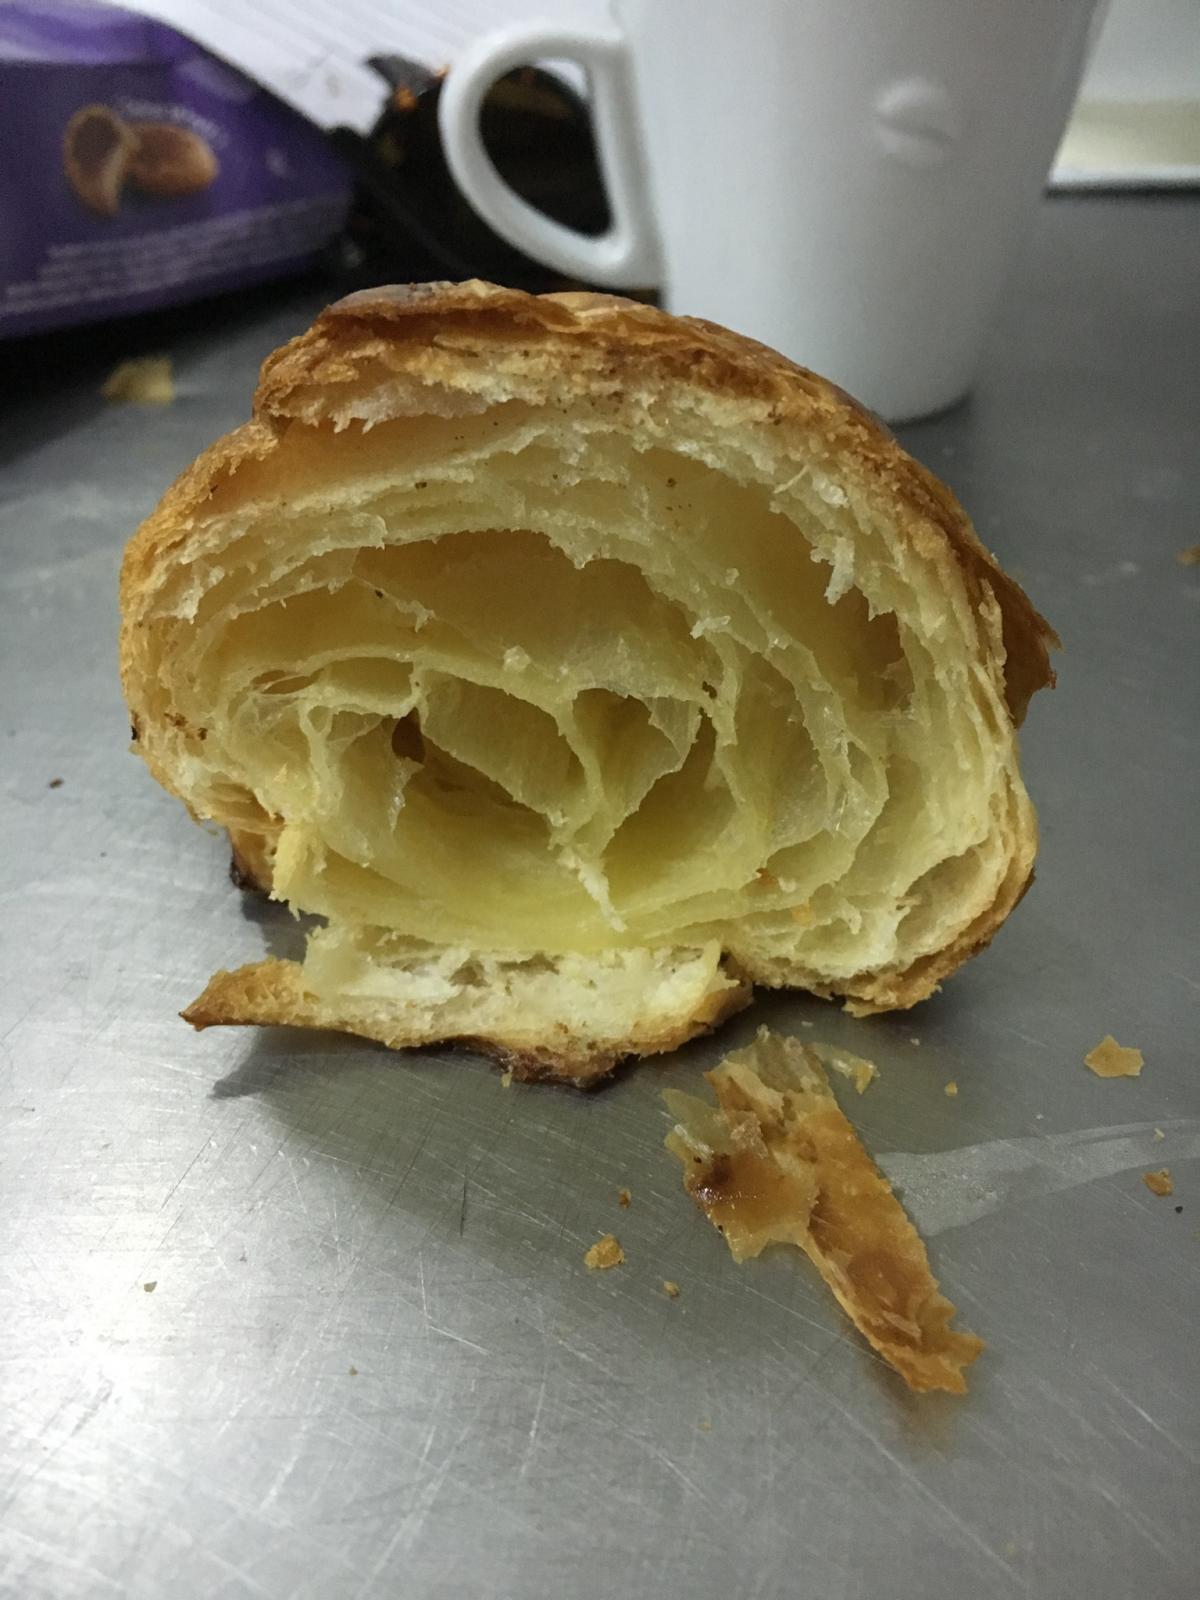 Inside croissant